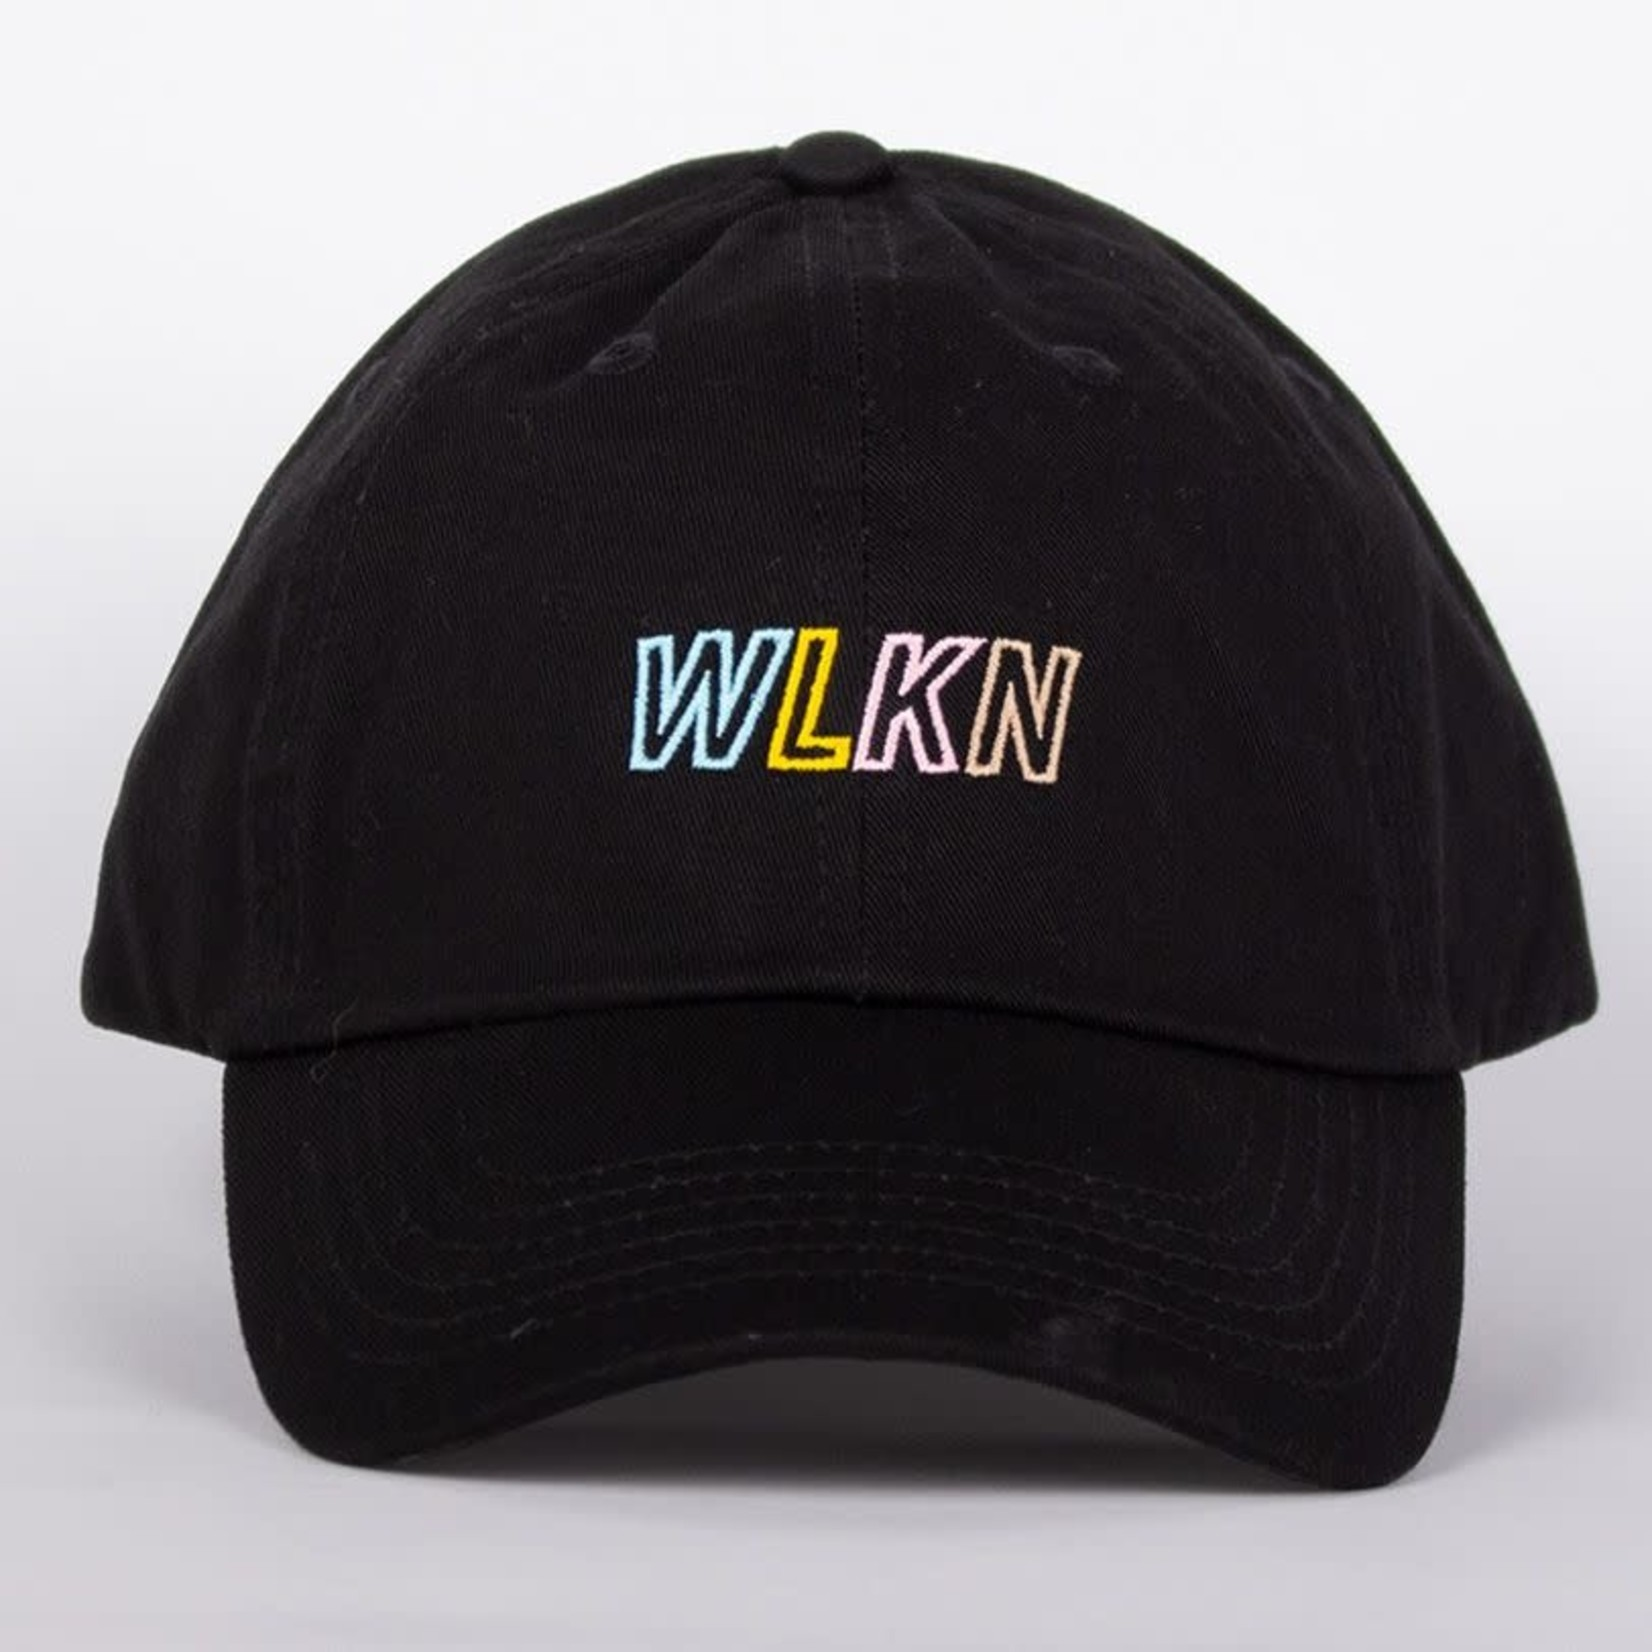 WLKN WLKN : Colored Dad Hat